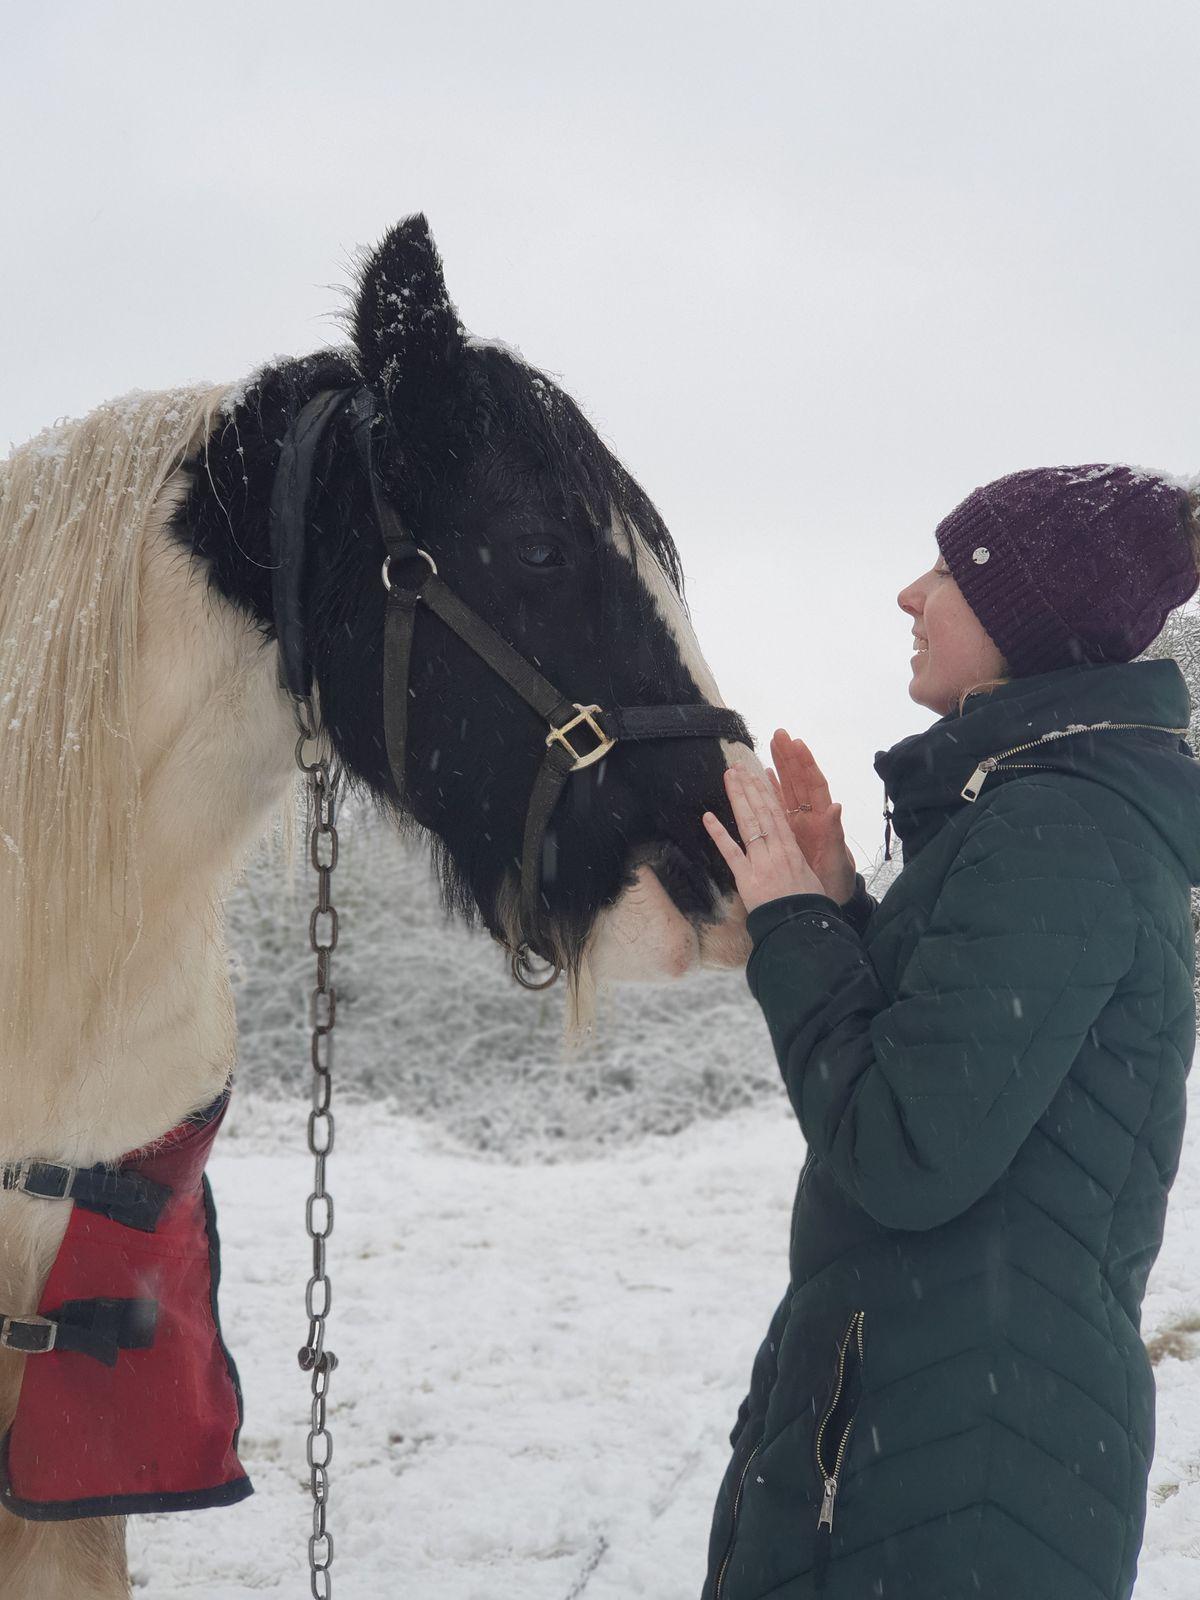 Horse lover Abbie Onions in snowy Wednesfield. Photo: Sally-Ann Fox